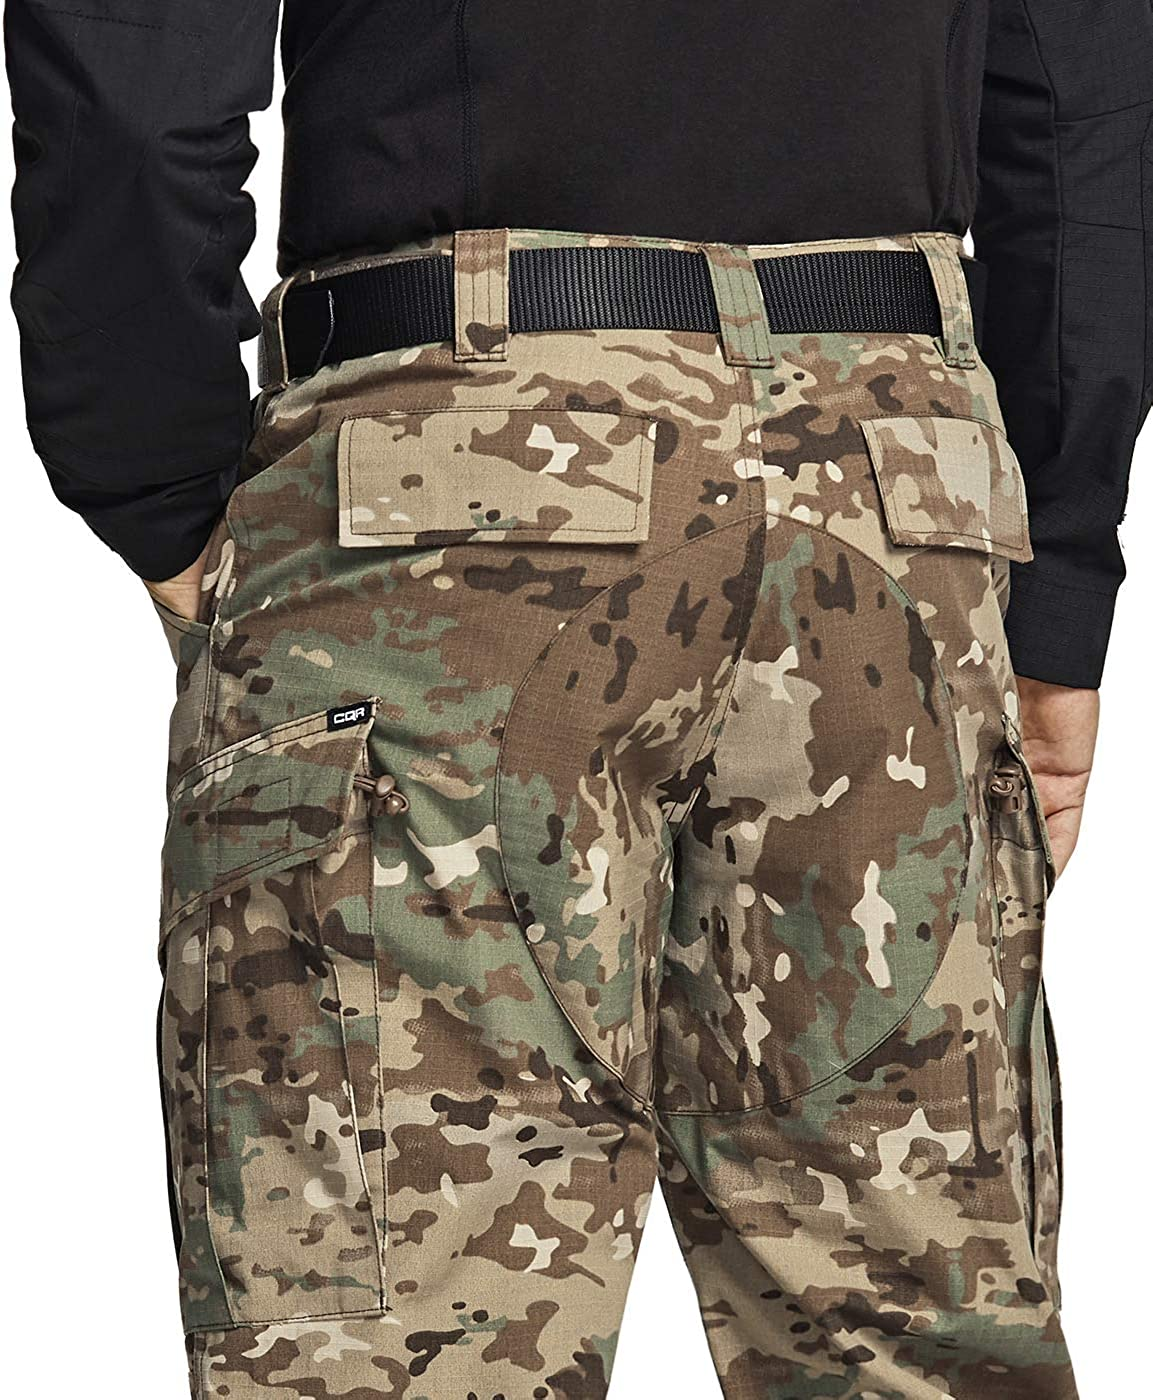 Military Combat BDU//ACU Cargo Pants Water Repellent Ripstop Work Pants CQR Mens Tactical Pants Hiking Outdoor Apparel